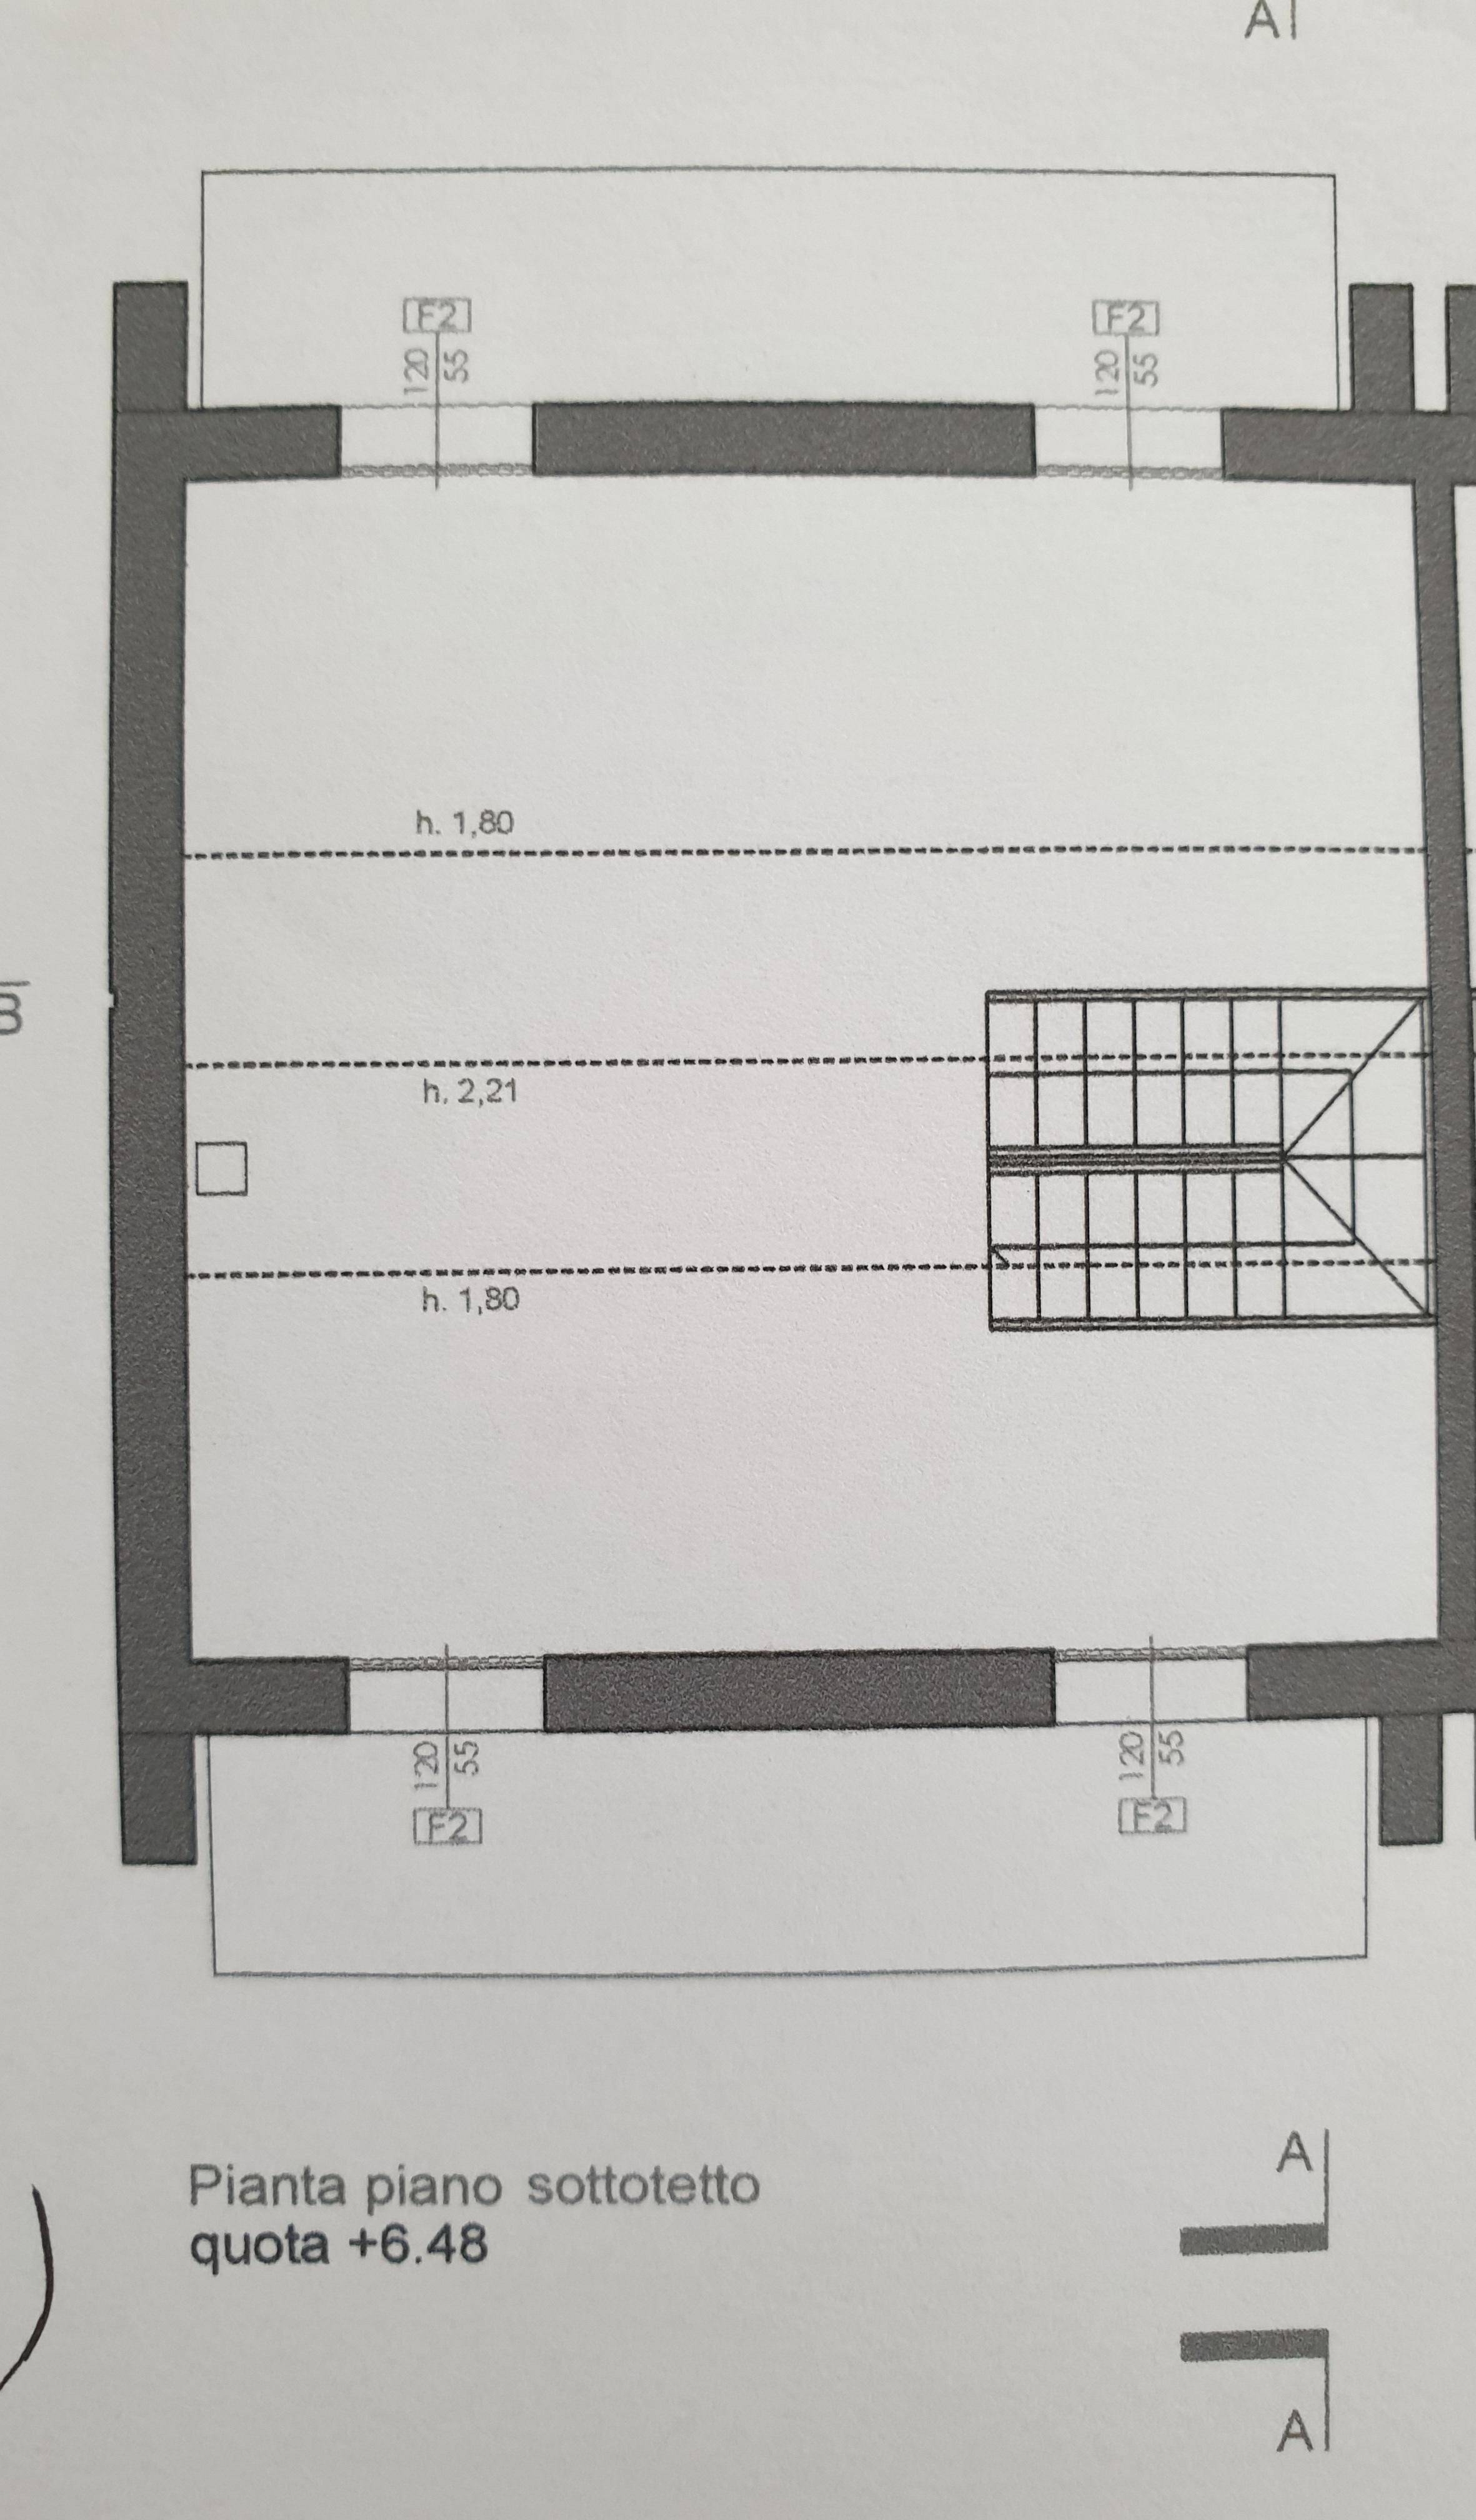 Villetta bifamiliare in vendita, rif. MI686 (Planimetria 3/3)